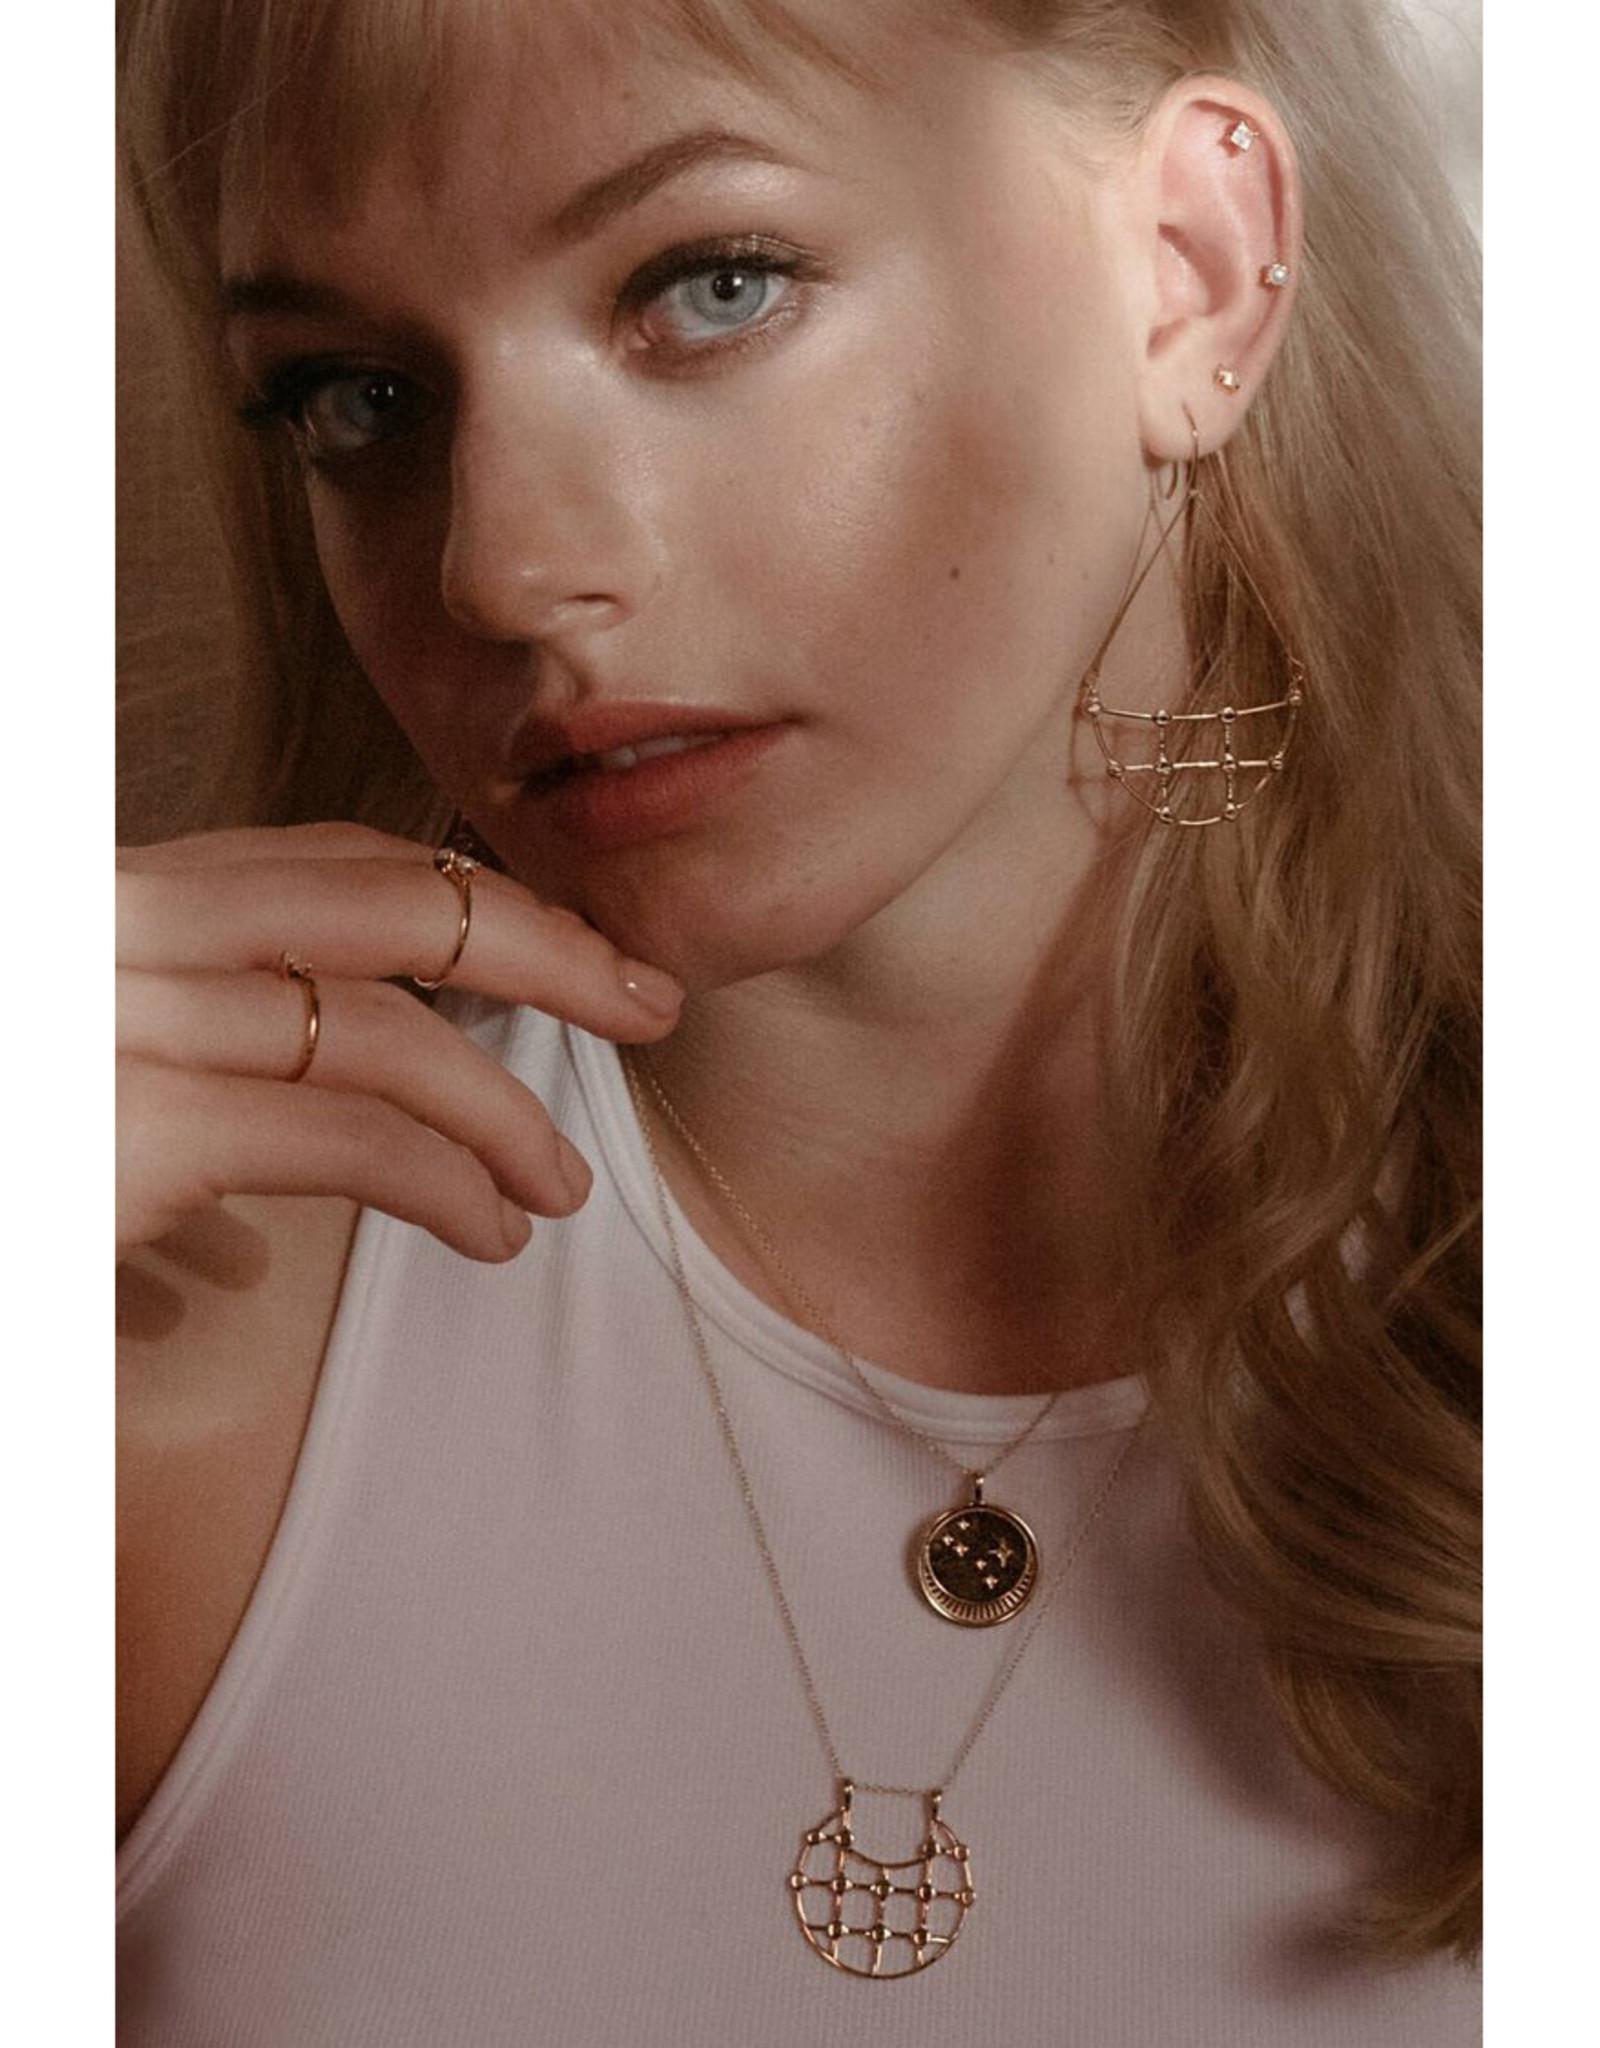 Sarah Mulder Jewelry Willa Earrings - Silver